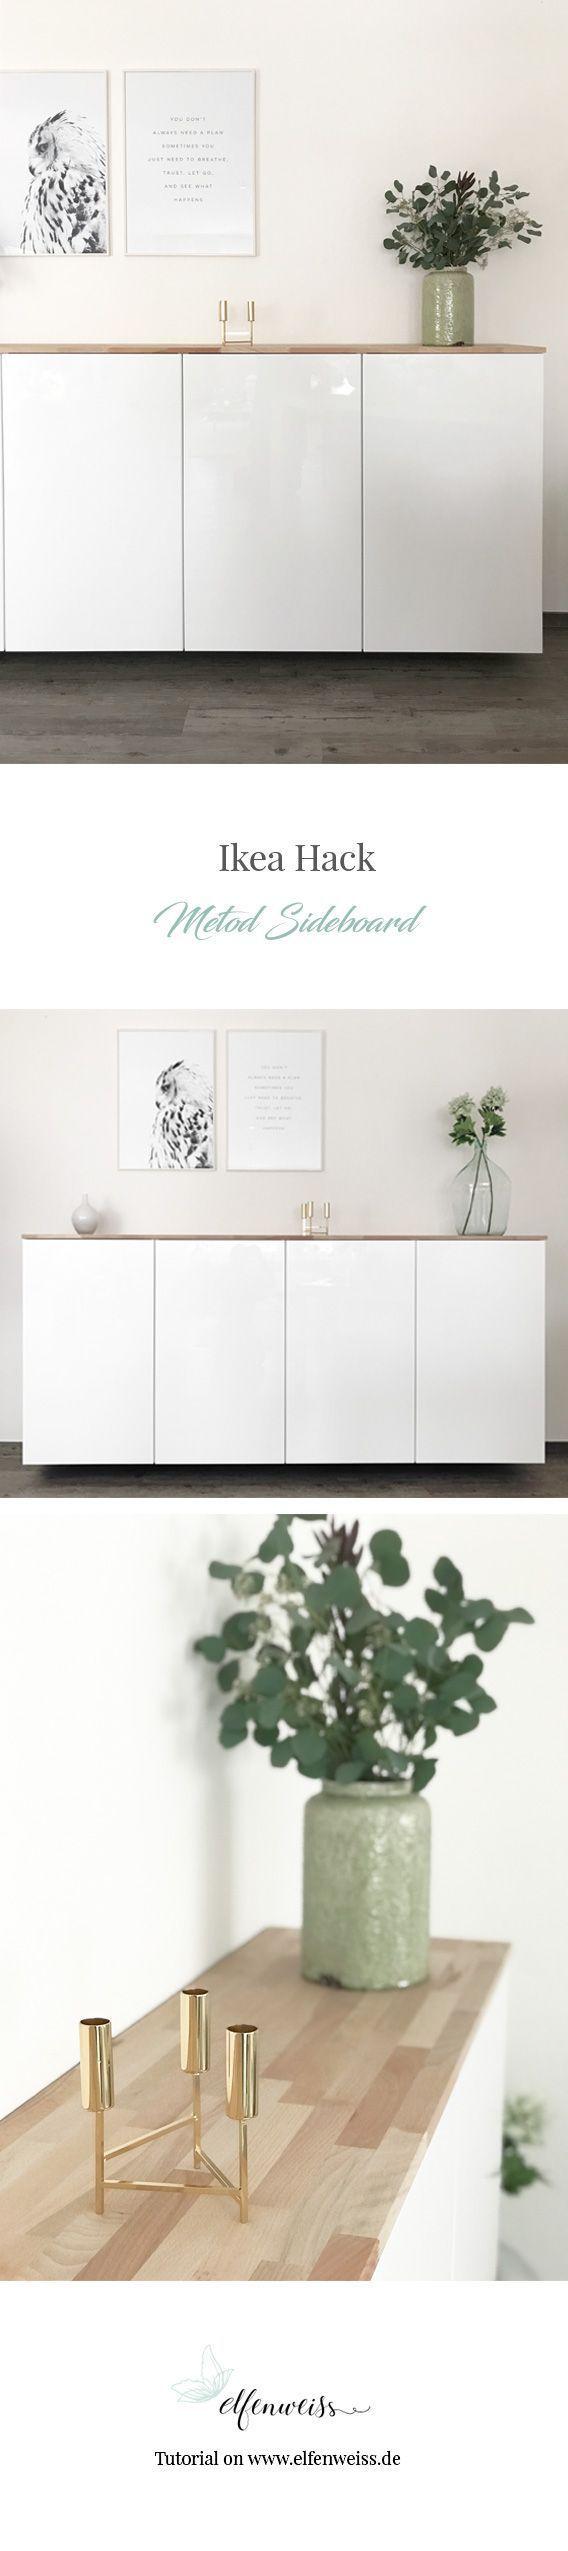 A Comprehensive Overview On Home Decoration Ikea Diy Ikea Hack